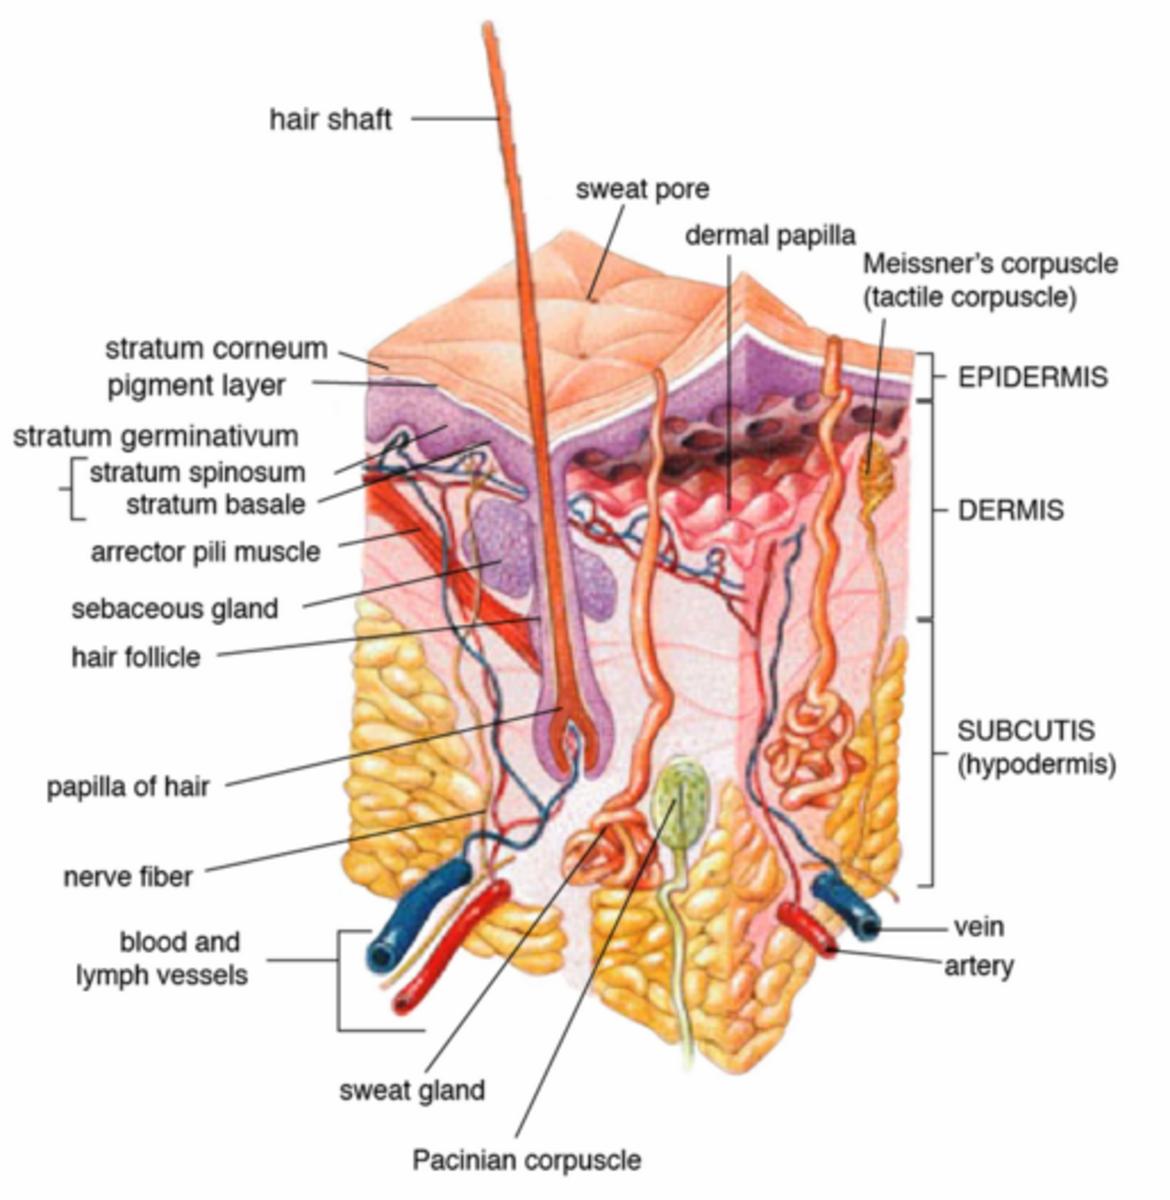 Skin anatomy and skin follicle, Wikipedia Commons Public Domain